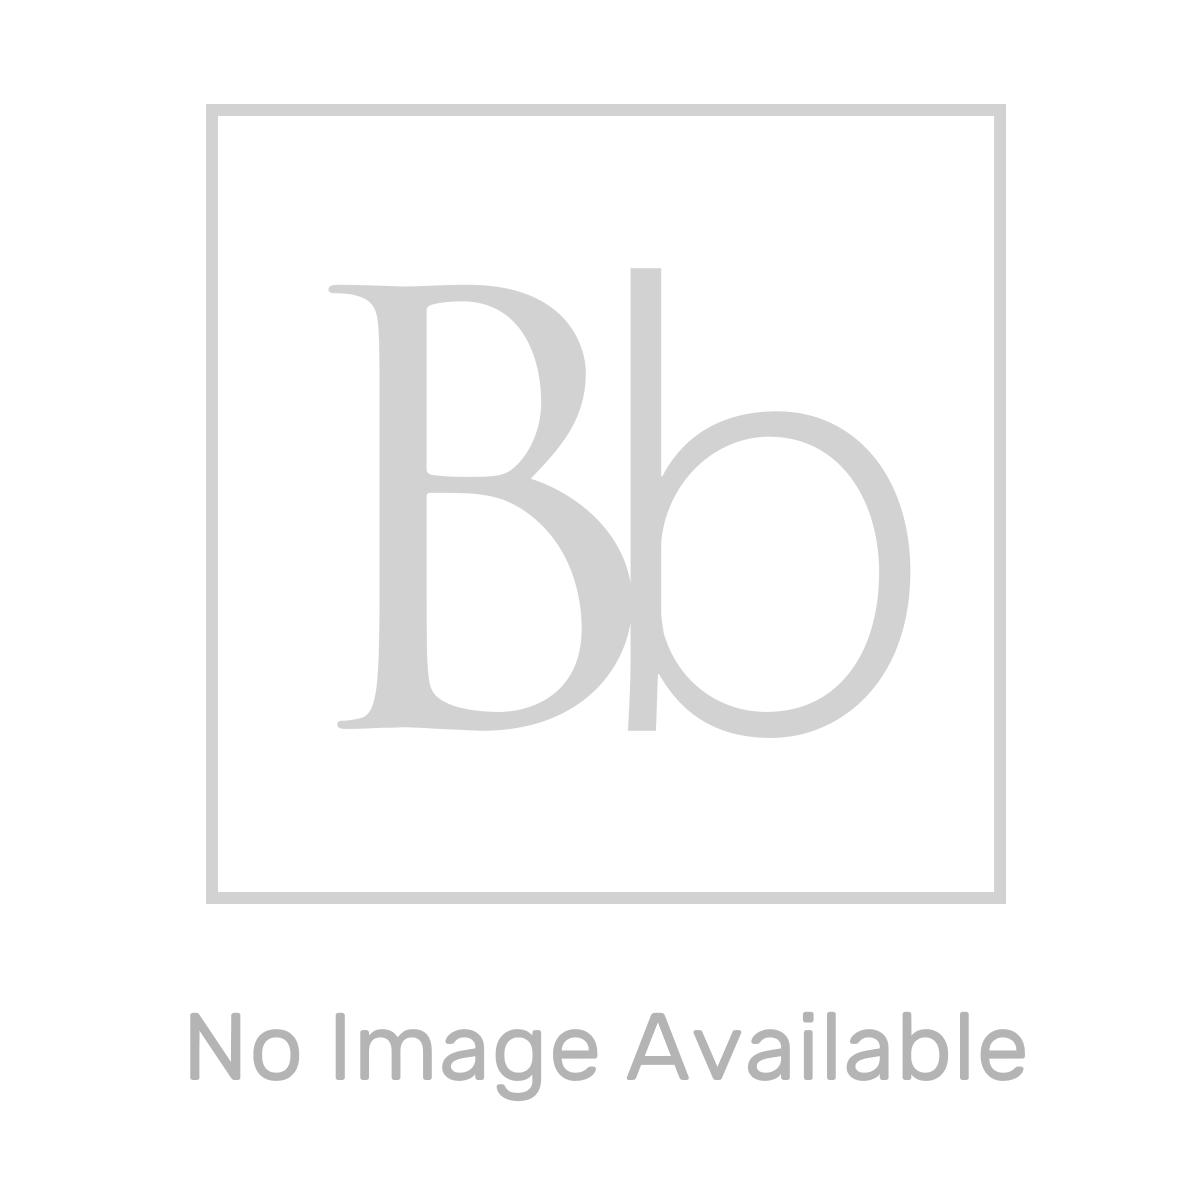 Nuie Athena Gloss White 2 Door Floor Standing Vanity Unit with 50mm Profile Basin 600mm